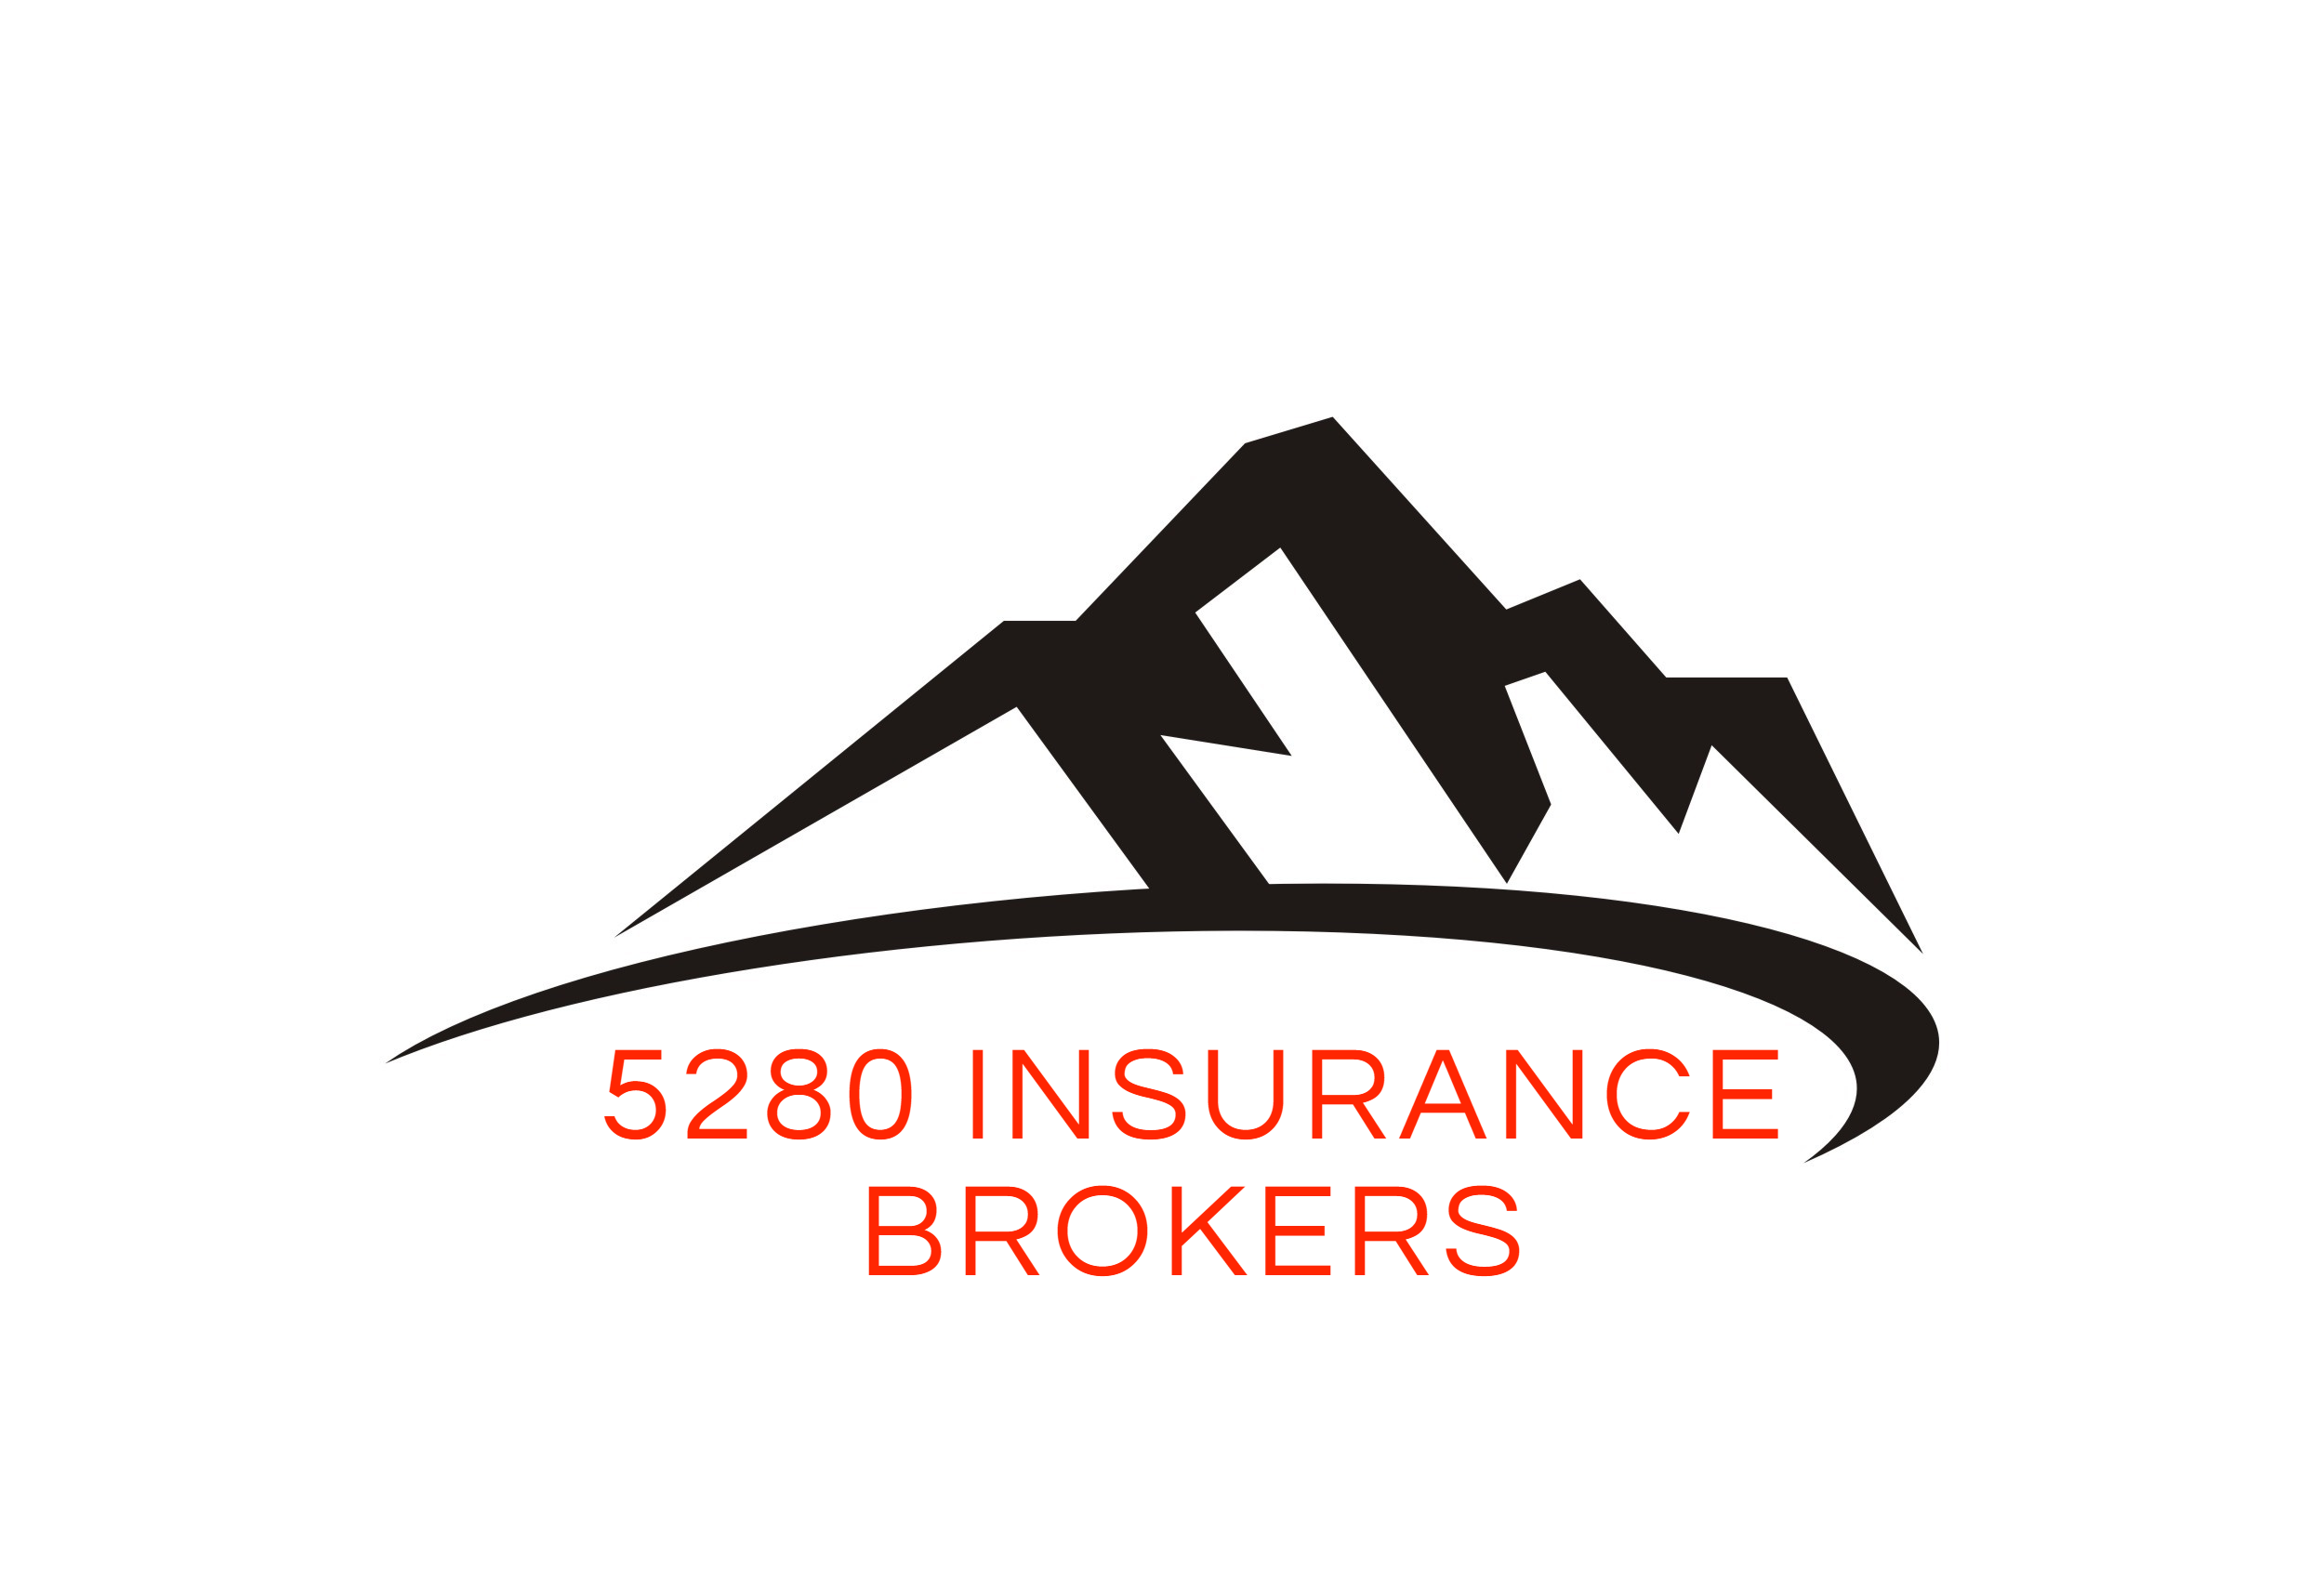 5280 Insurance Brokers